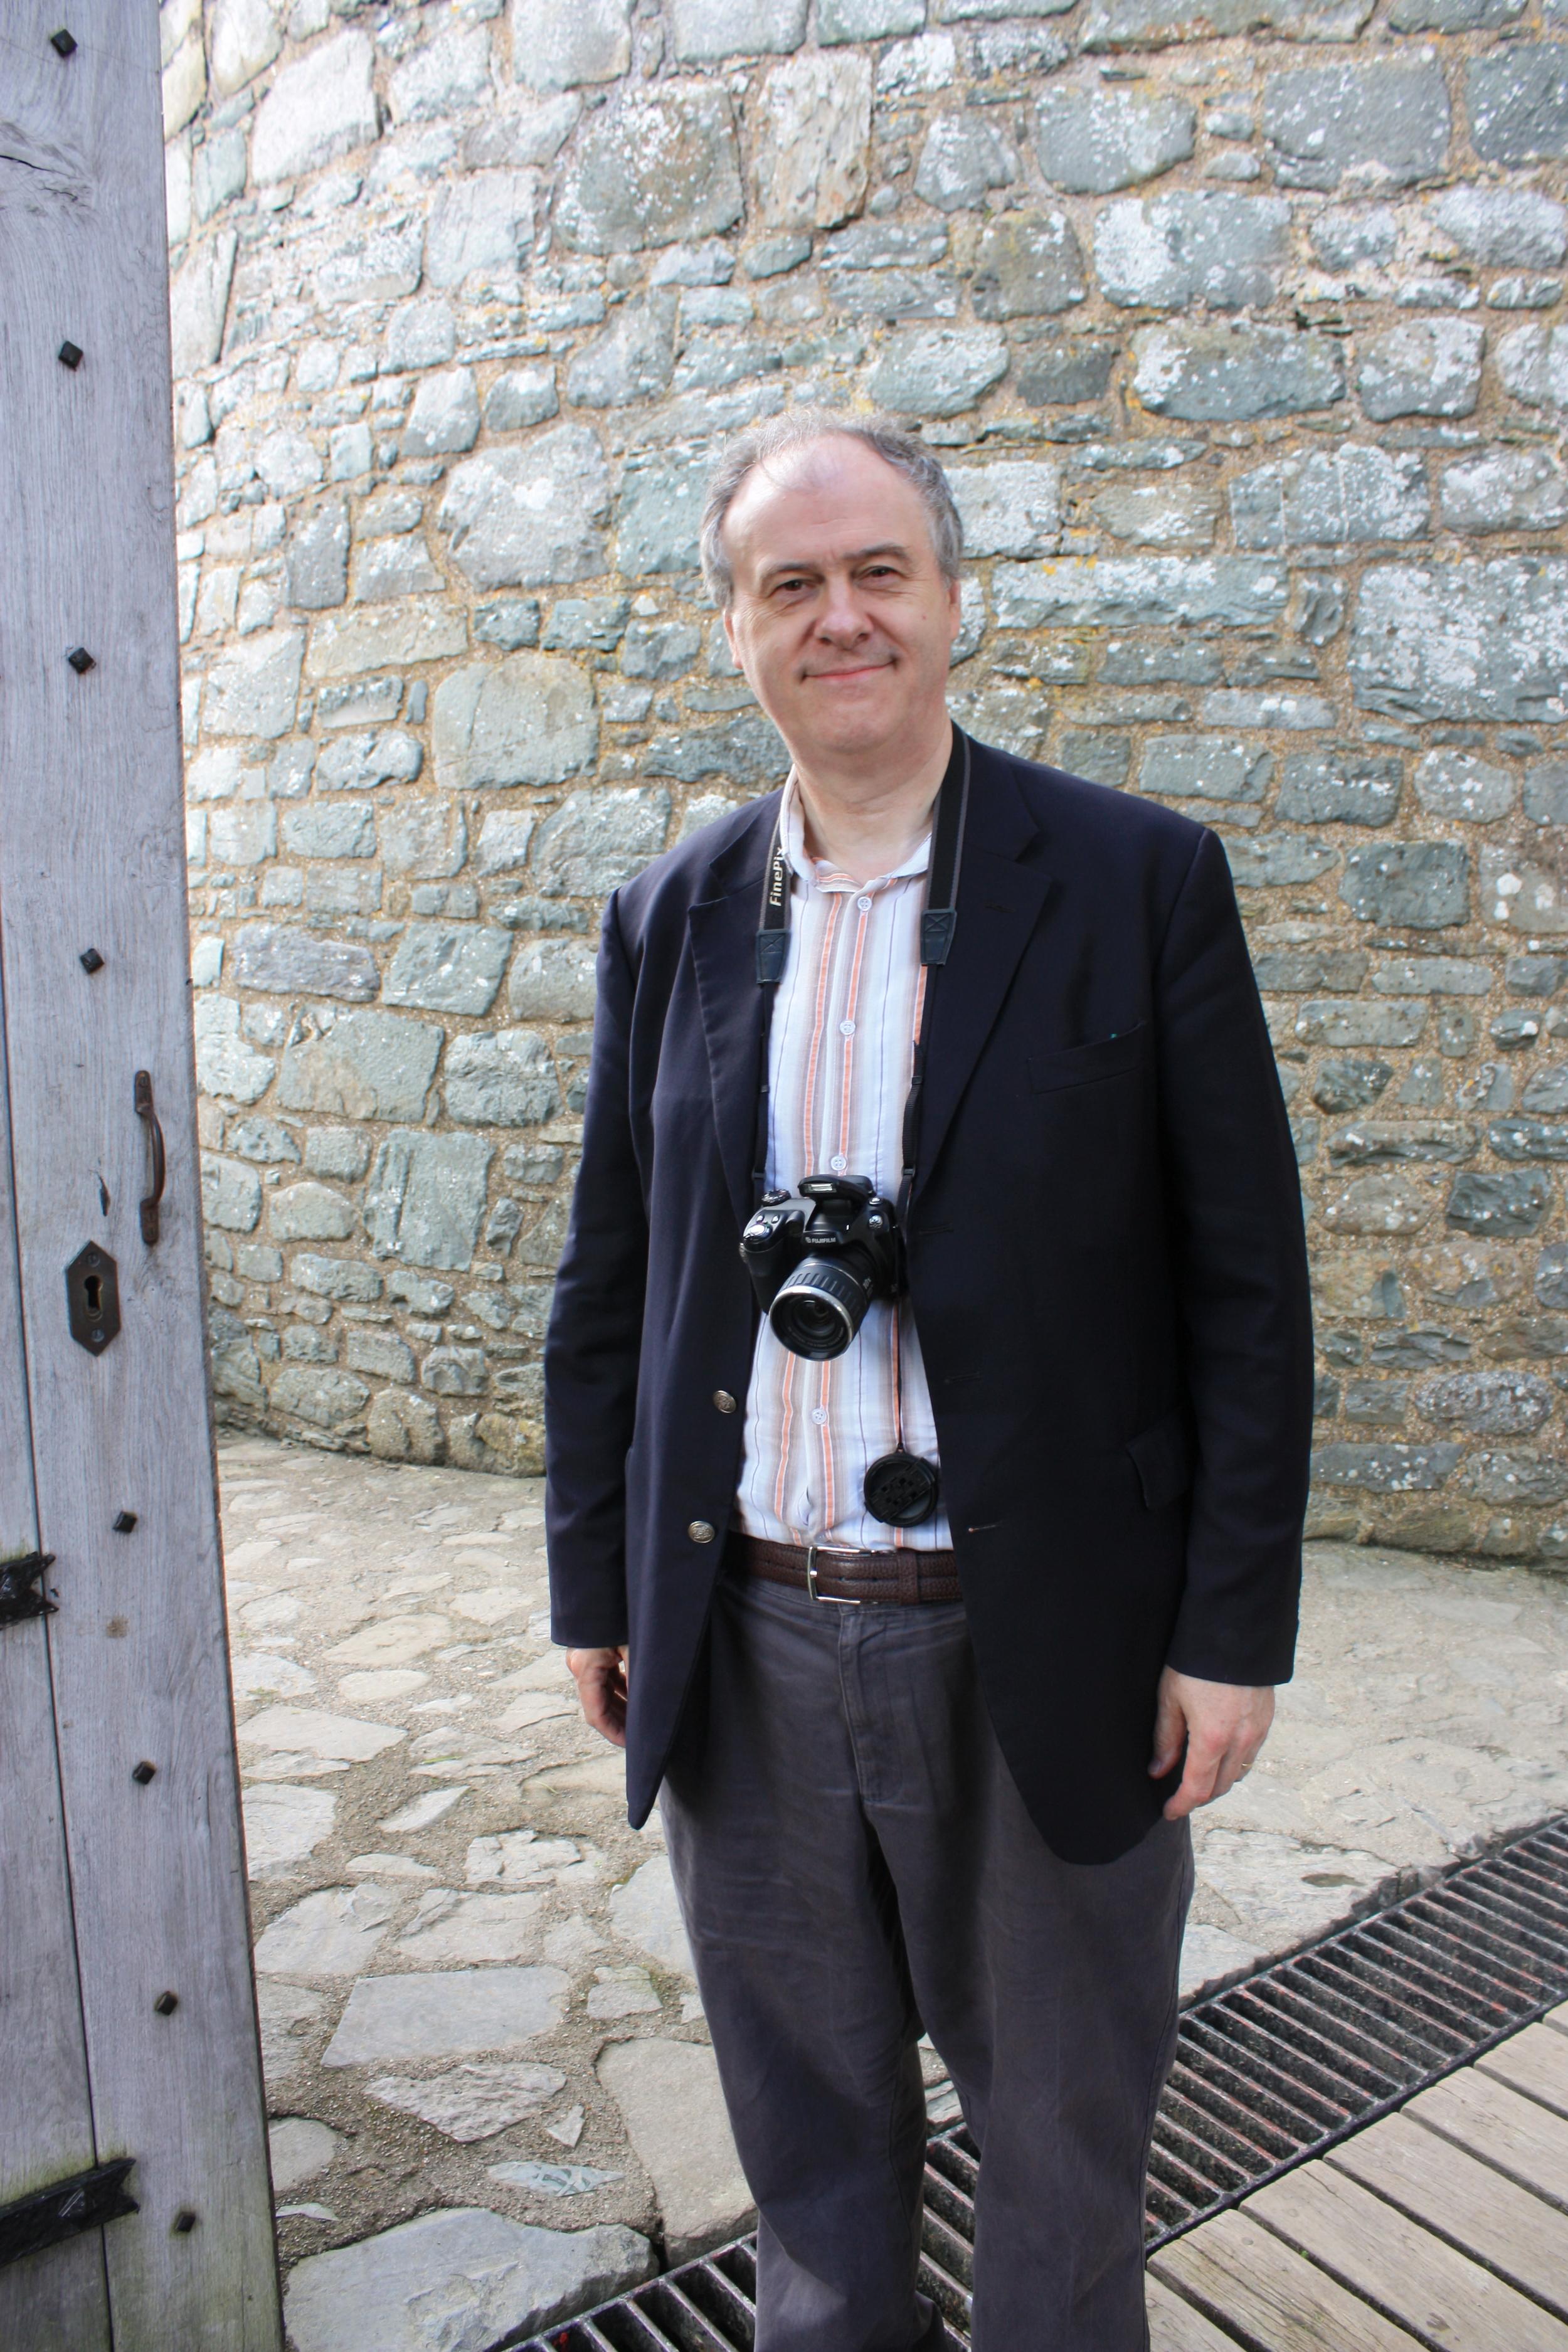 John at Harlech Castle